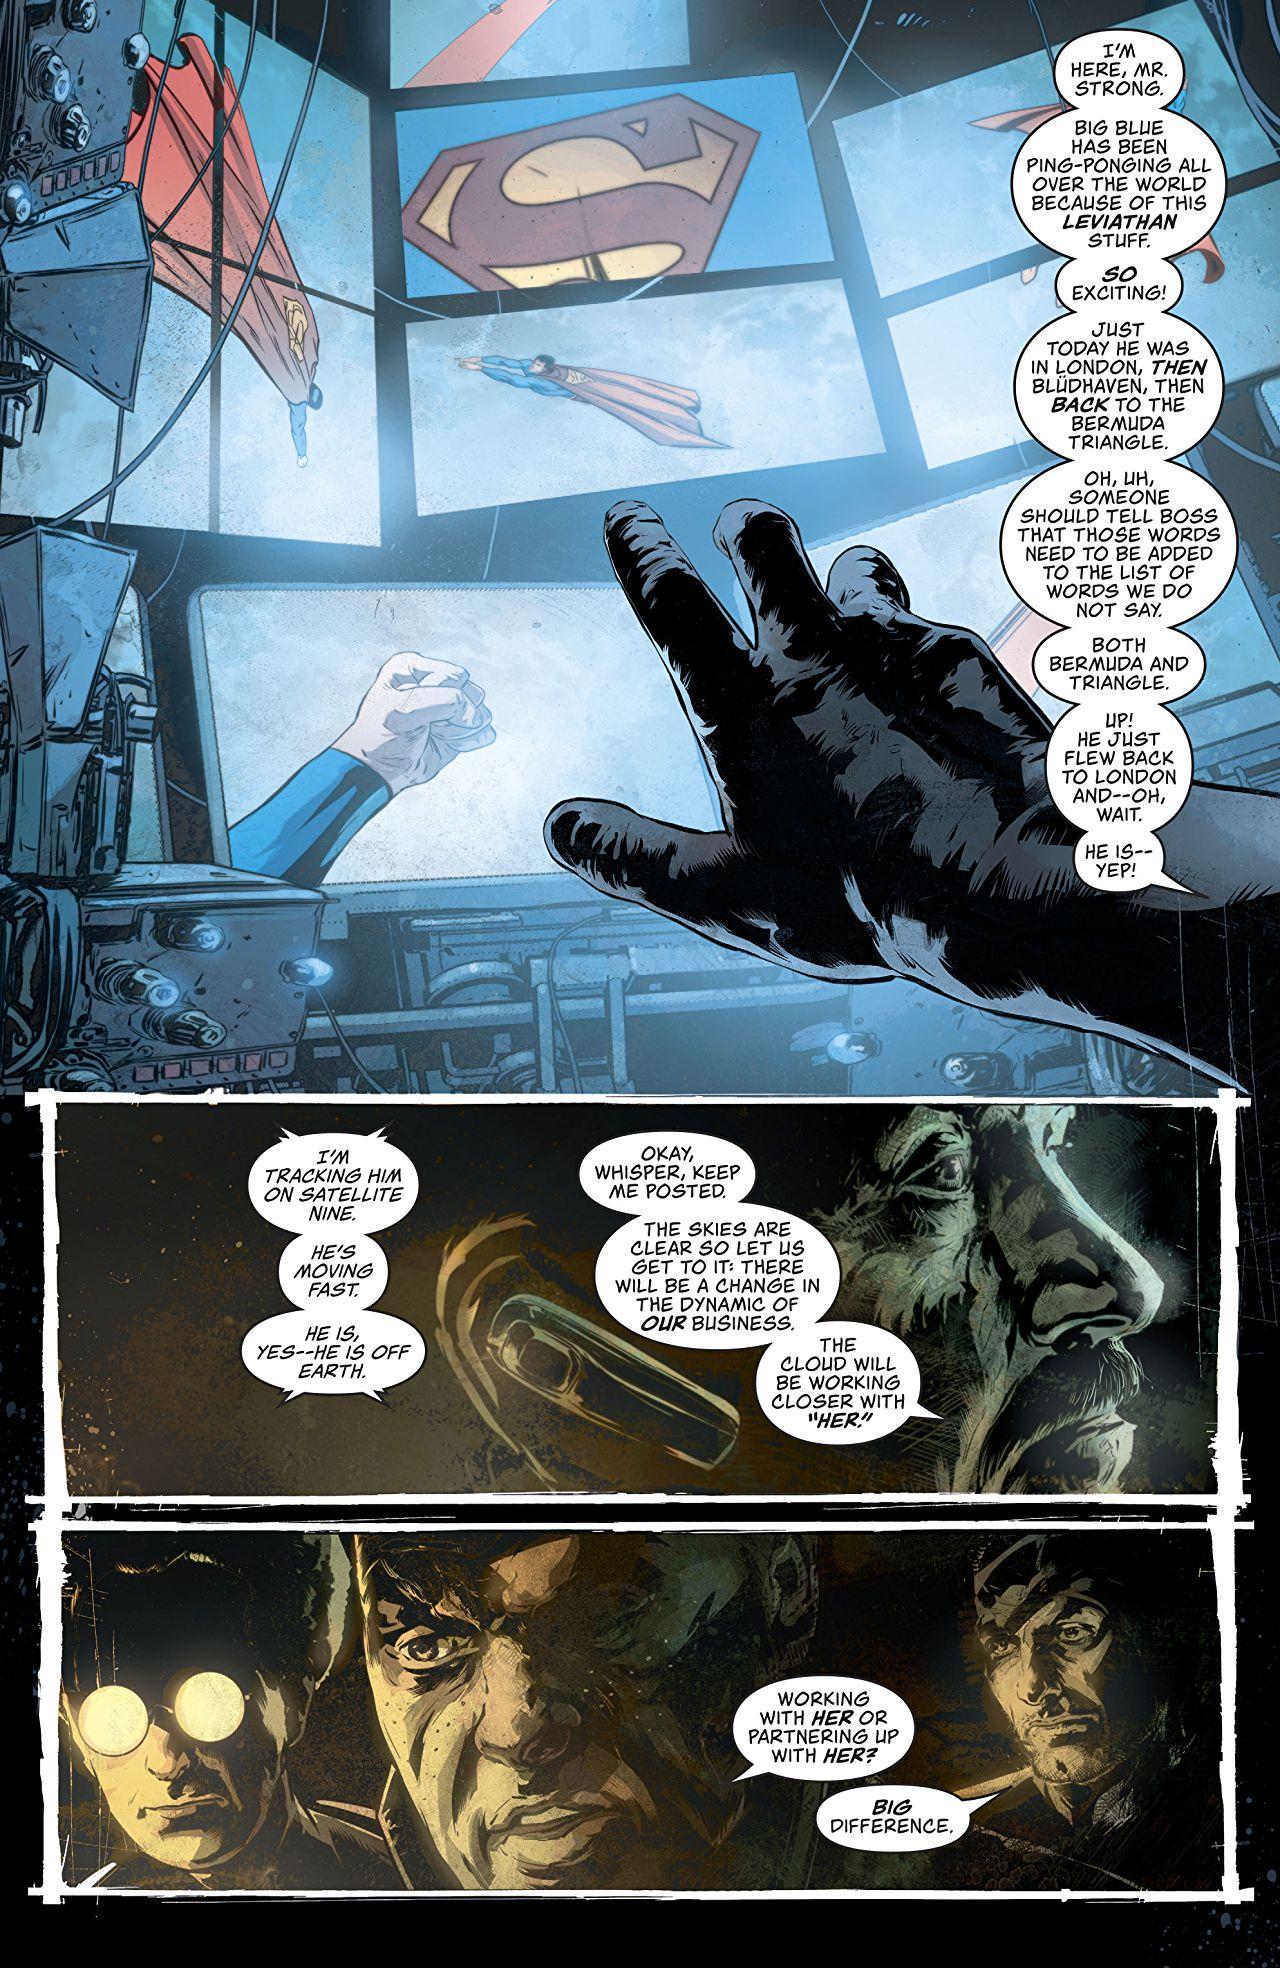 Action Comics 1012 2.jpg